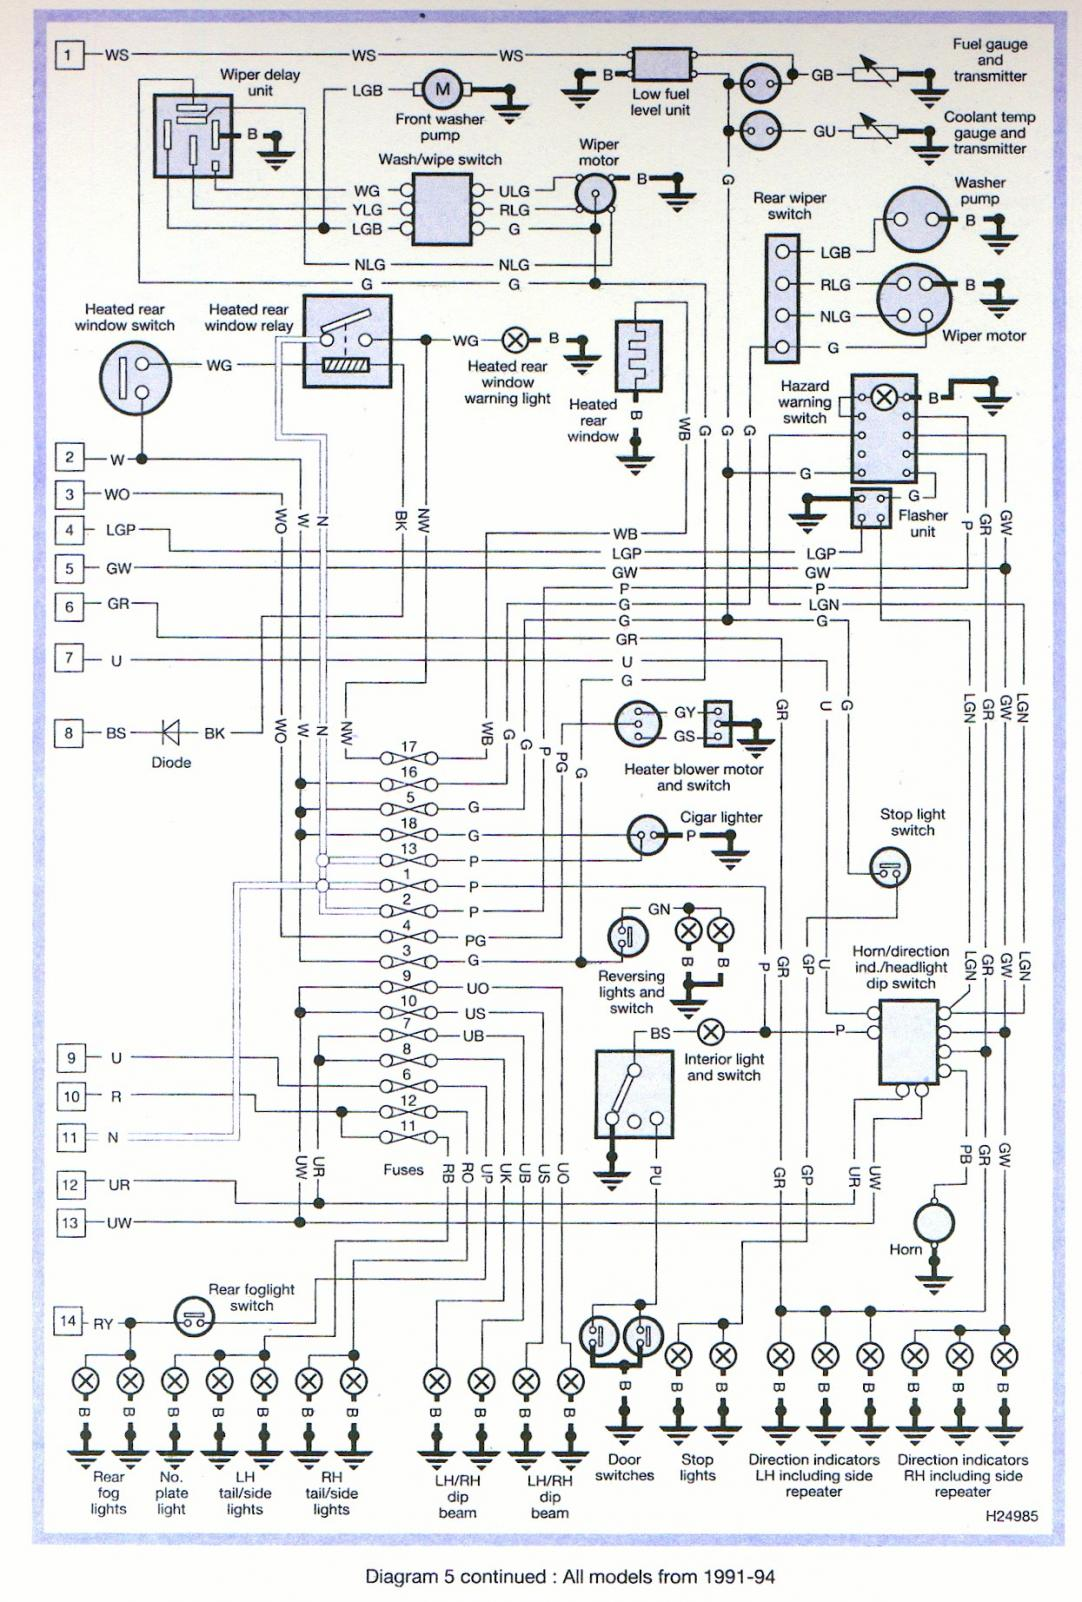 Wiring Diagram For Rover 100 Best Secret Two Doorbells 1992 Defender 110 32 Channel 6 D S Ph11 Rr Amp A